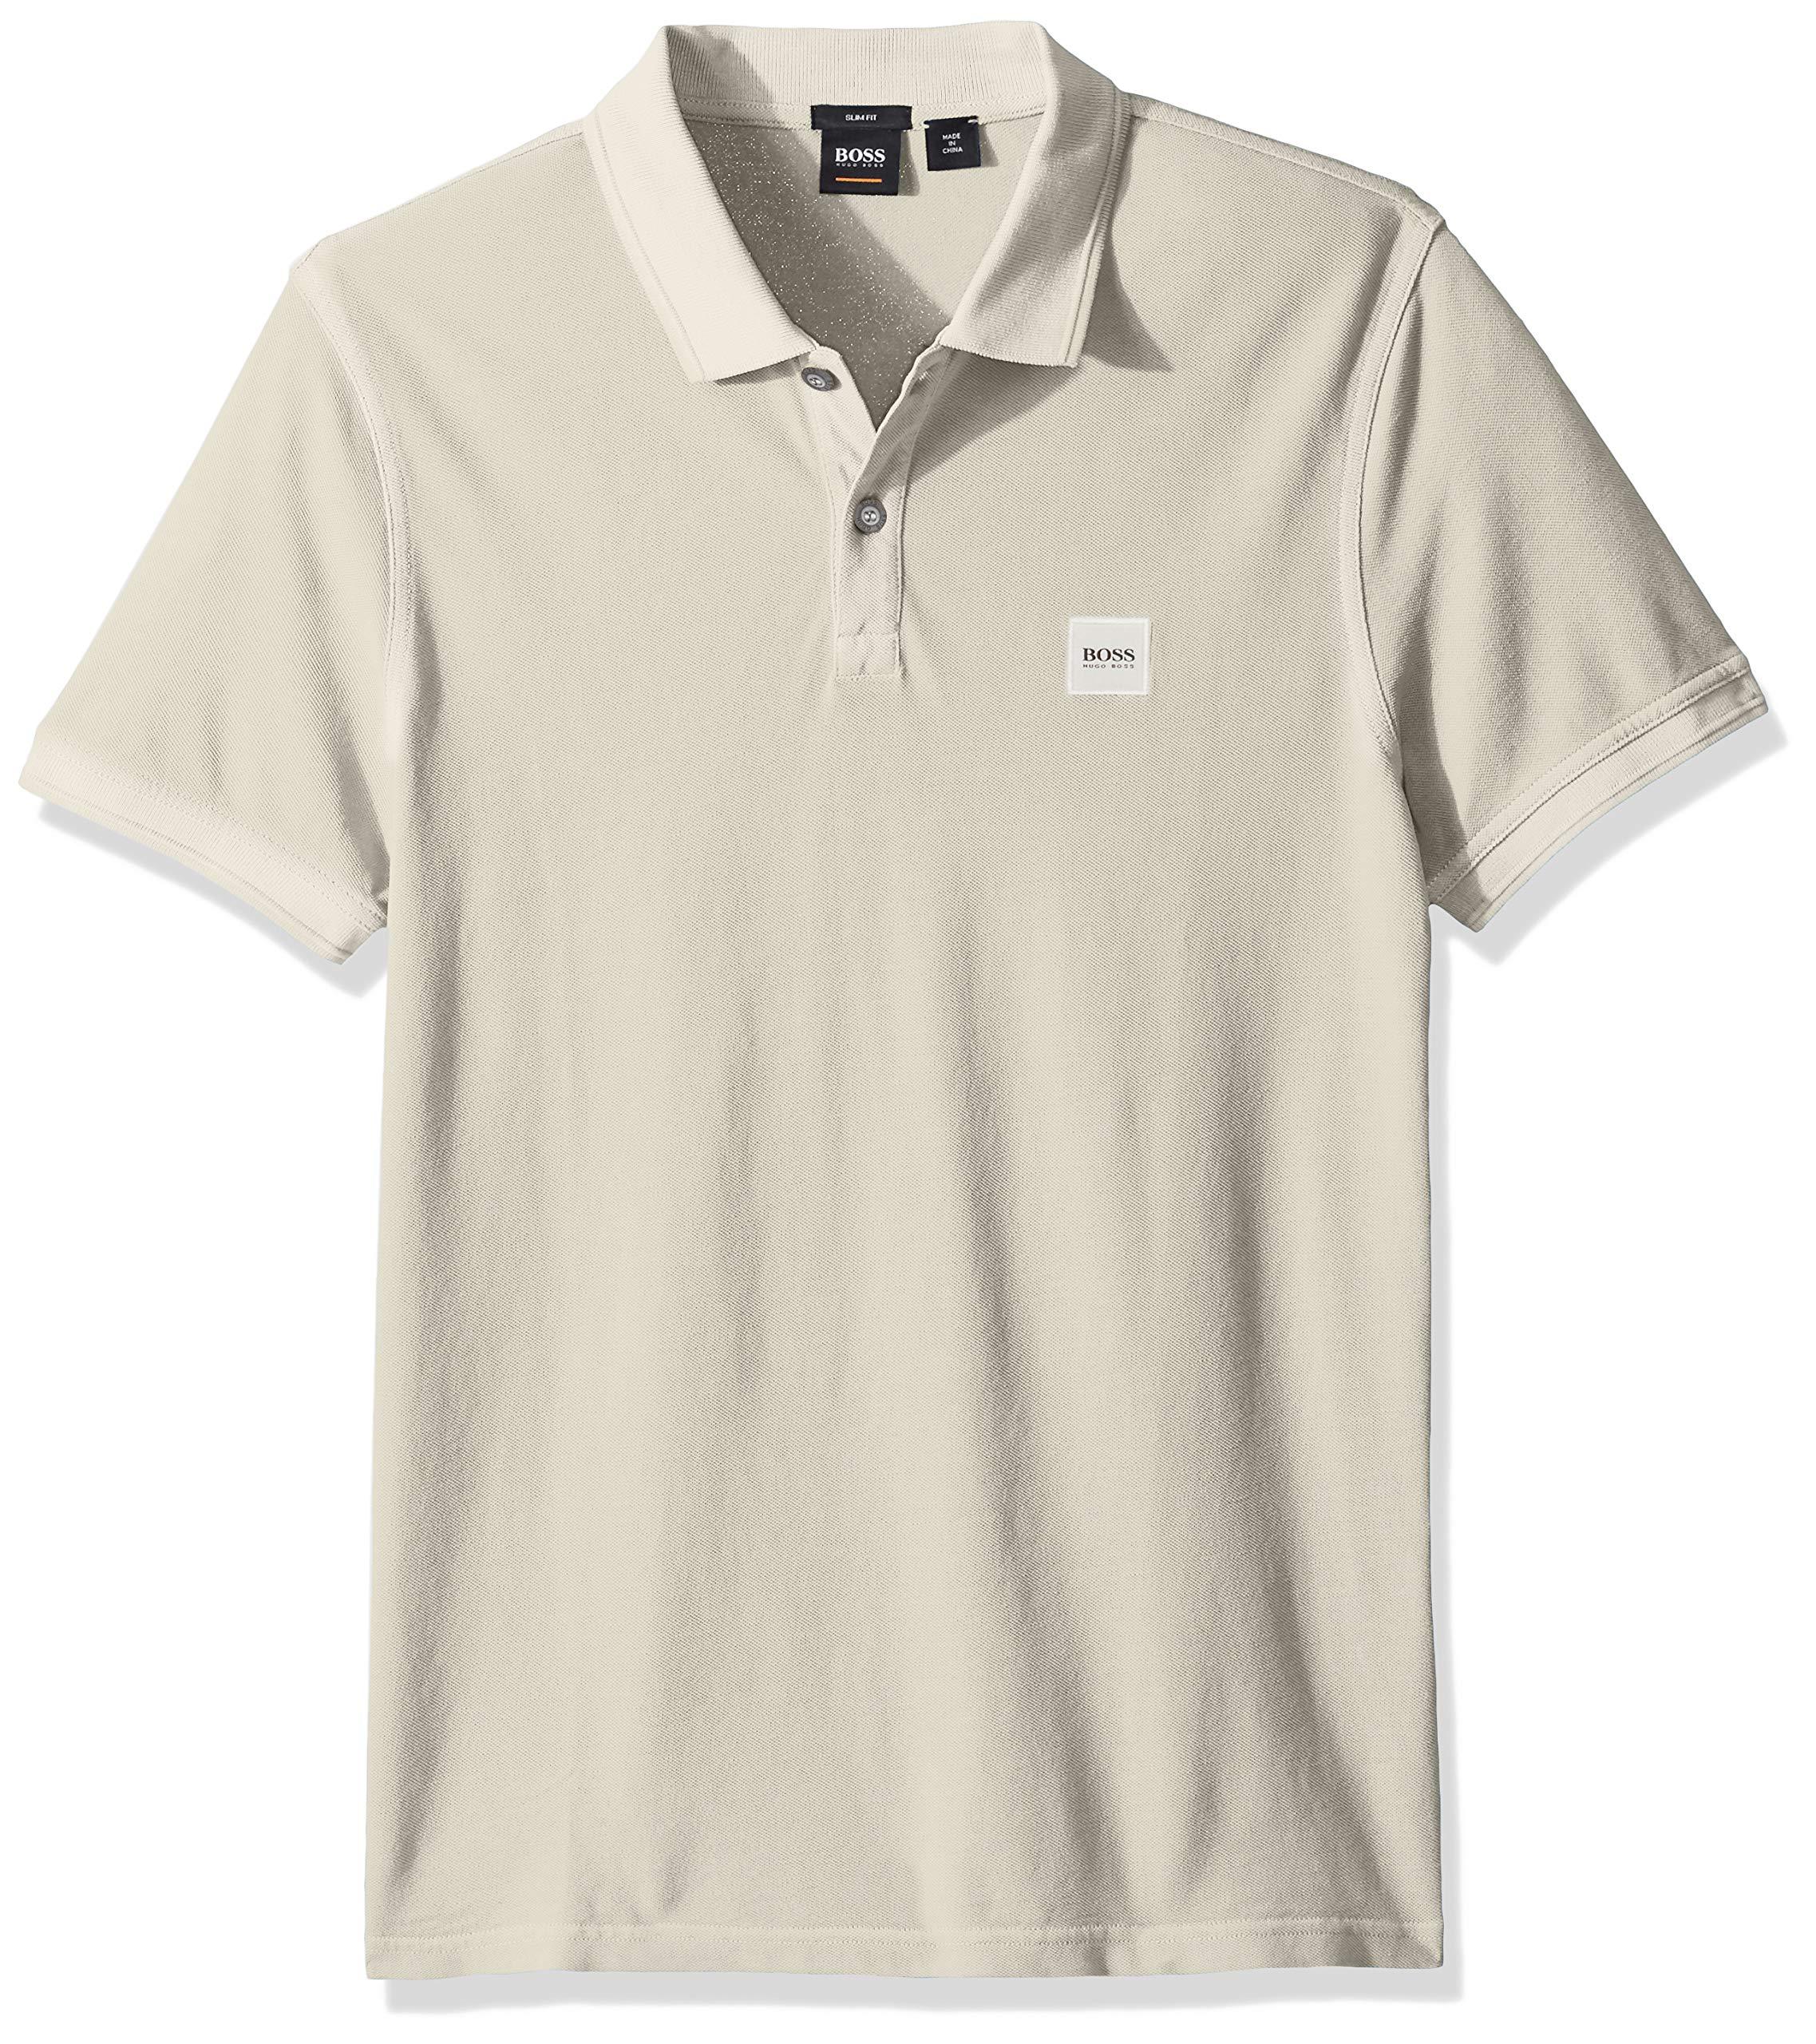 hugo boss polo shirt philippines